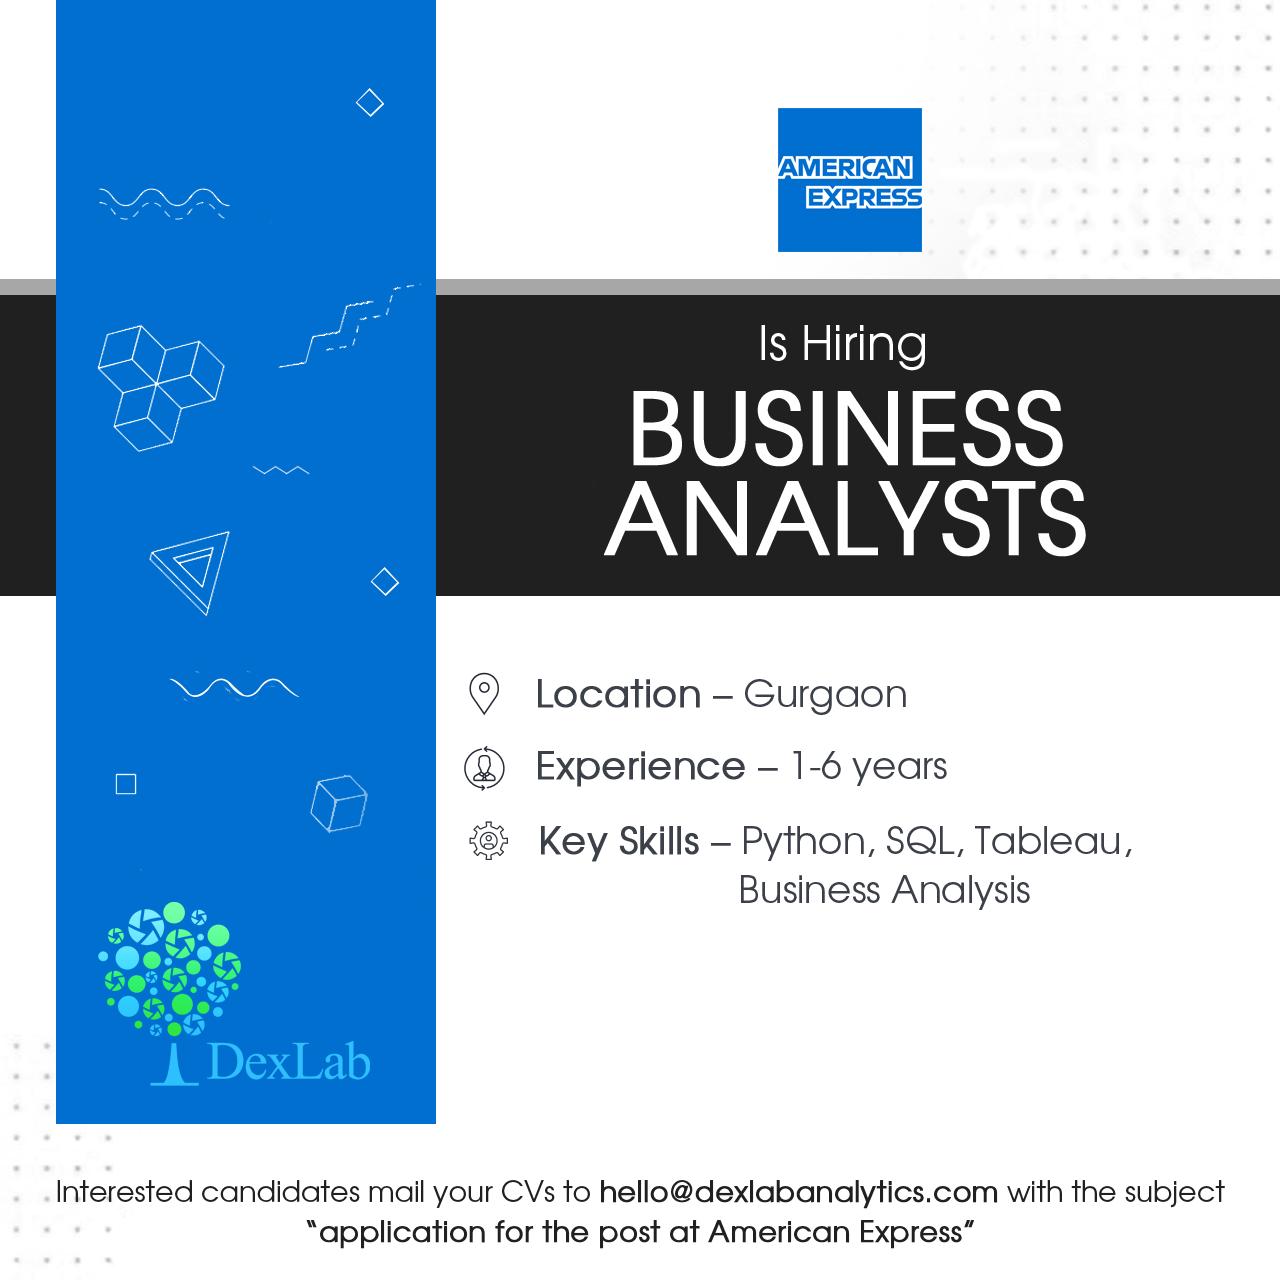 Contact Dexlabanalytics For Opportunities In Big Data Analytics Business Analysis Big Data Analytics Business Analyst